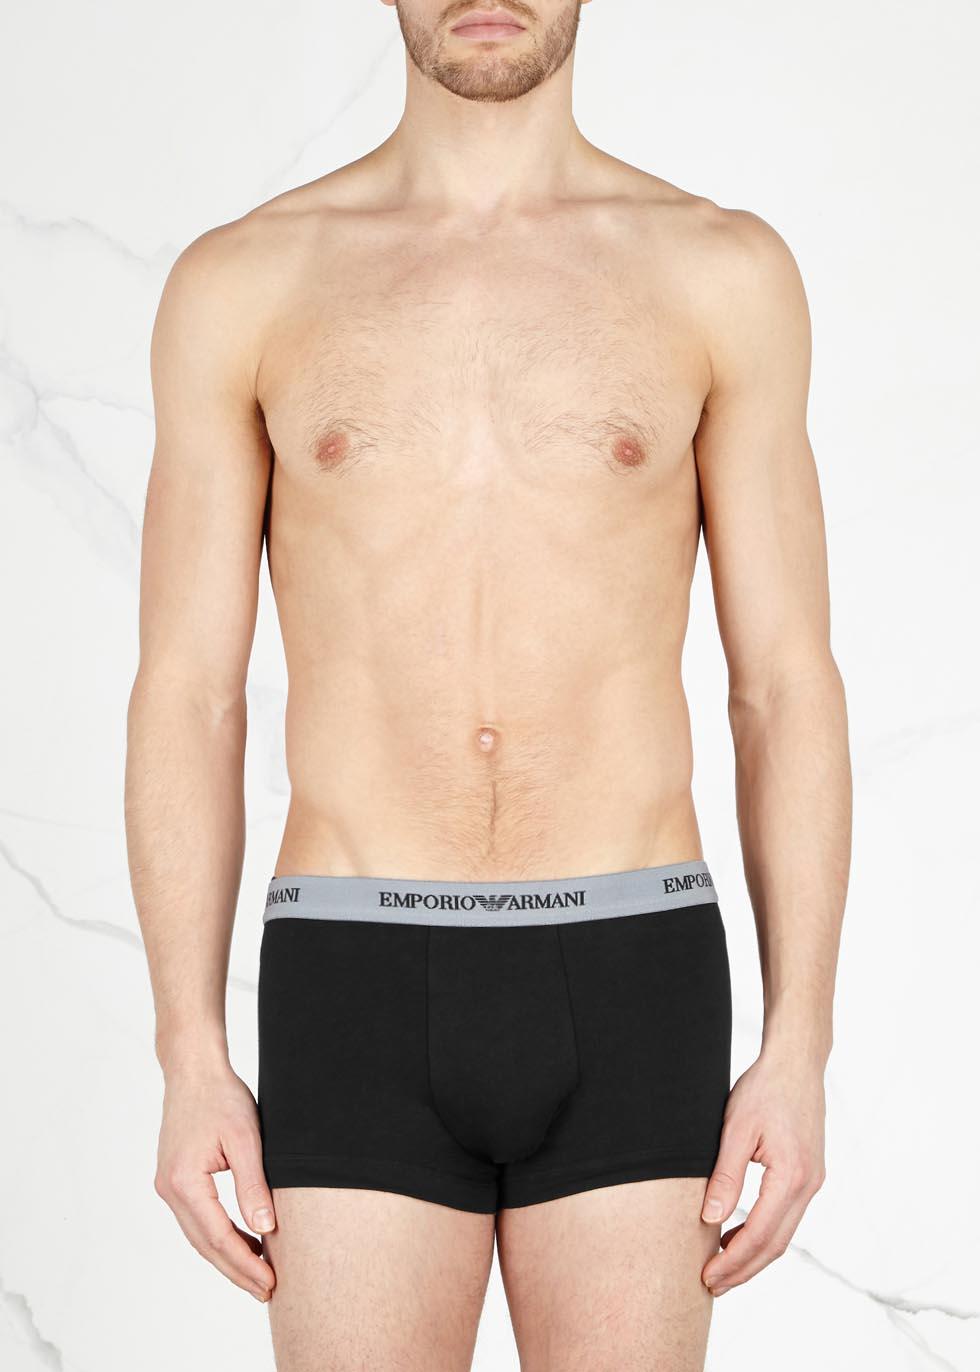 Black stretch cotton boxer briefs - set of three - Emporio Armani